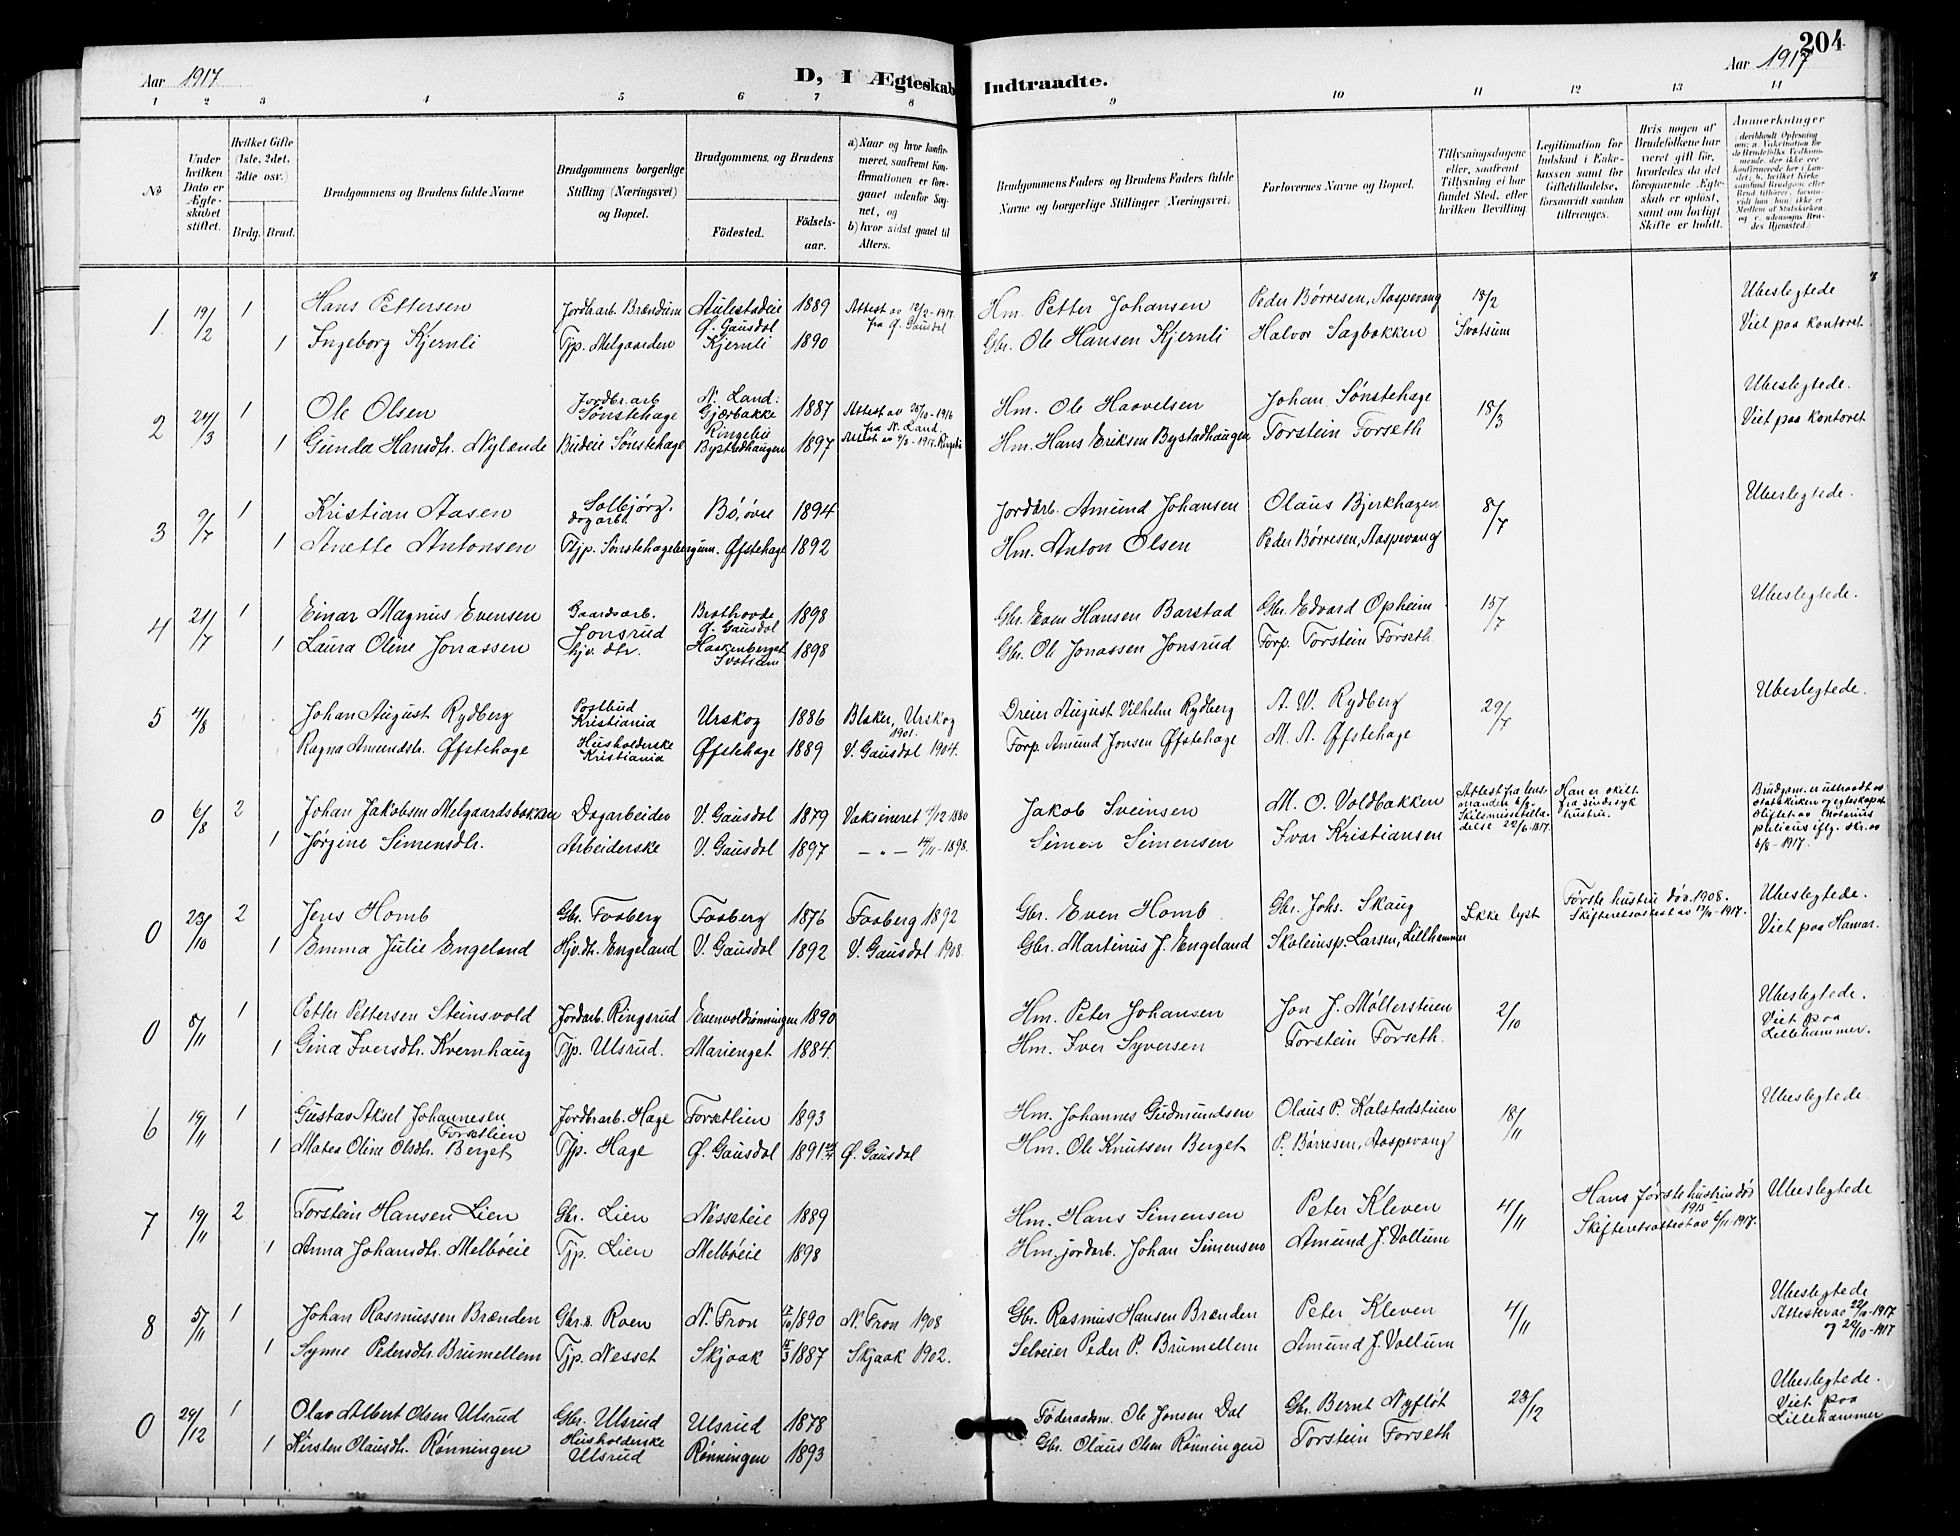 SAH, Vestre Gausdal prestekontor, Klokkerbok nr. 3, 1896-1925, s. 204